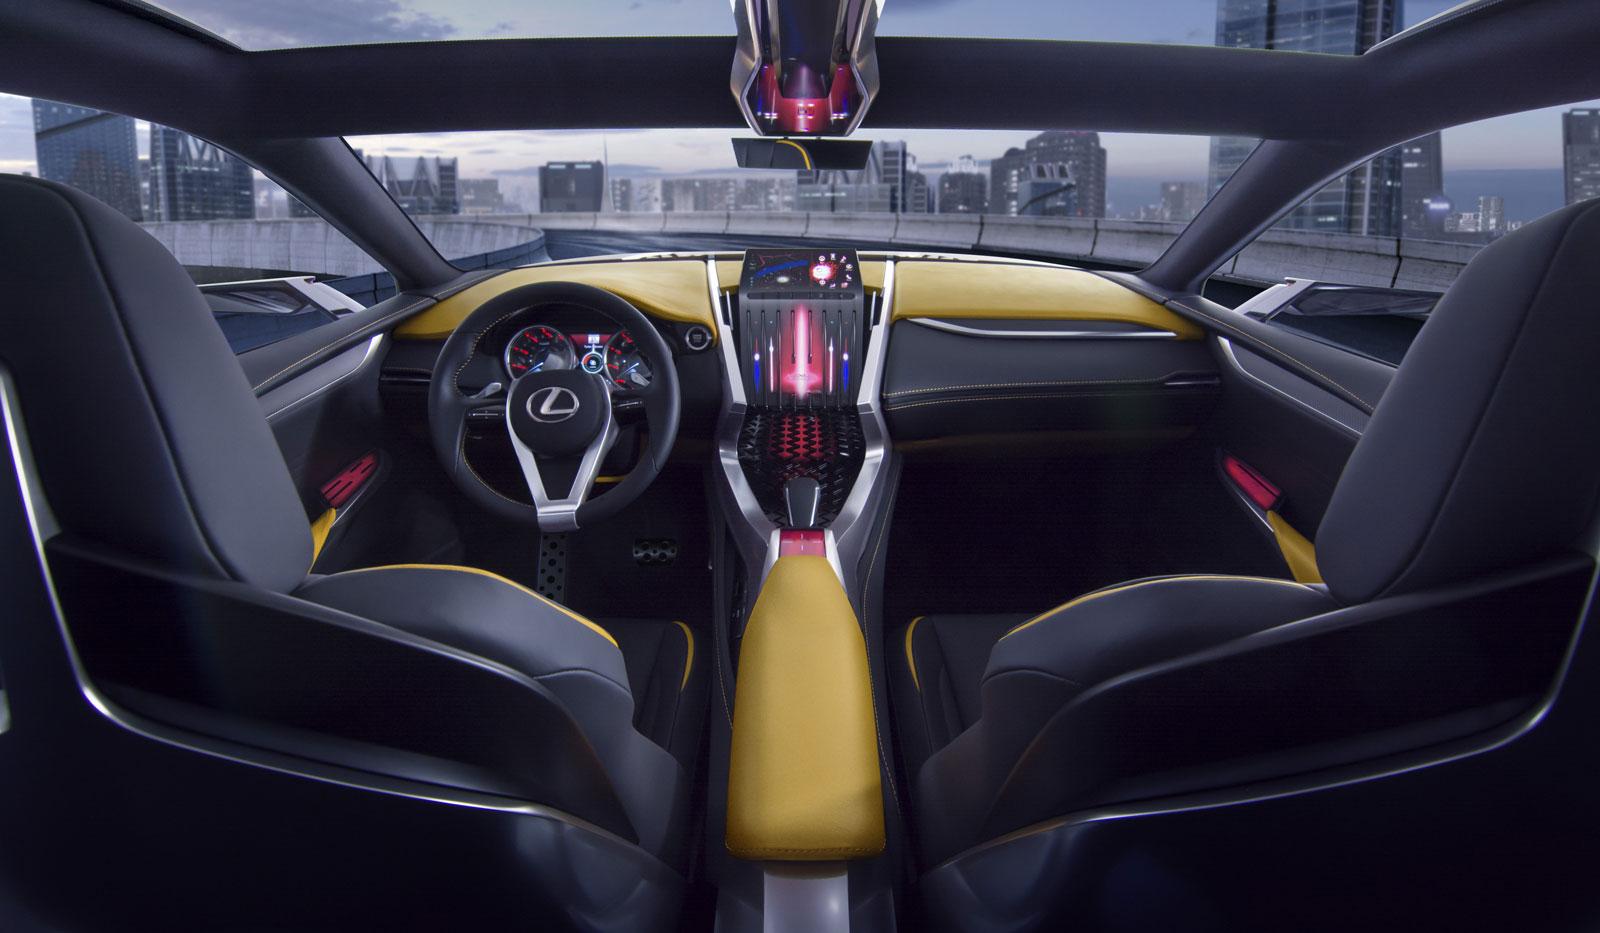 2013 Lexus LF-NX Turbo - Concepts